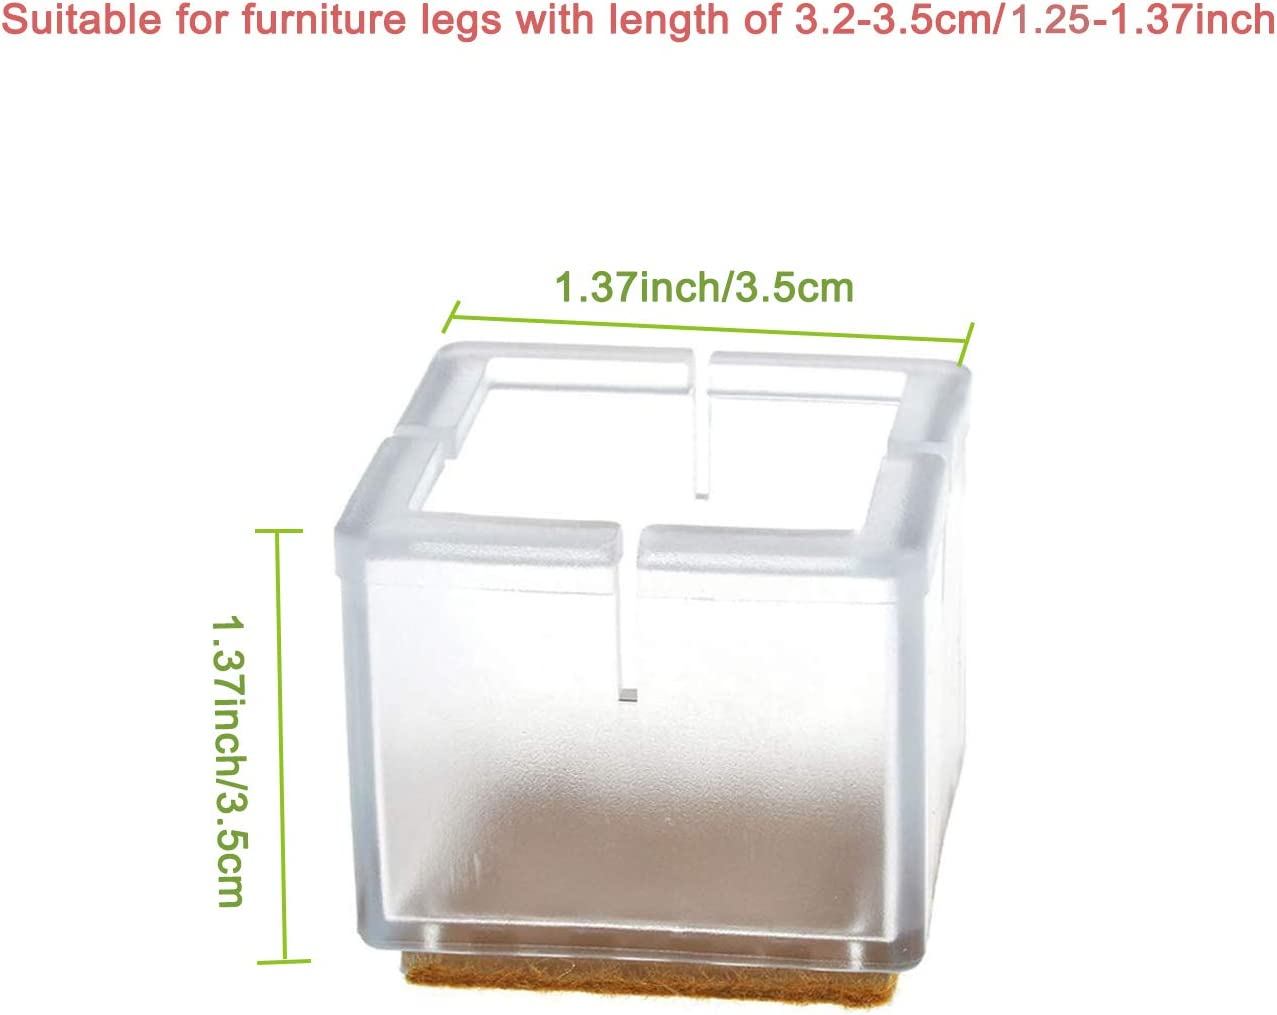 Patas de Mesa de Silicona Transparente para Patas de Muebles JWShang Protector de Suelo de Madera para Evitar ara/ñazos 24 Protectores para Patas de Silla